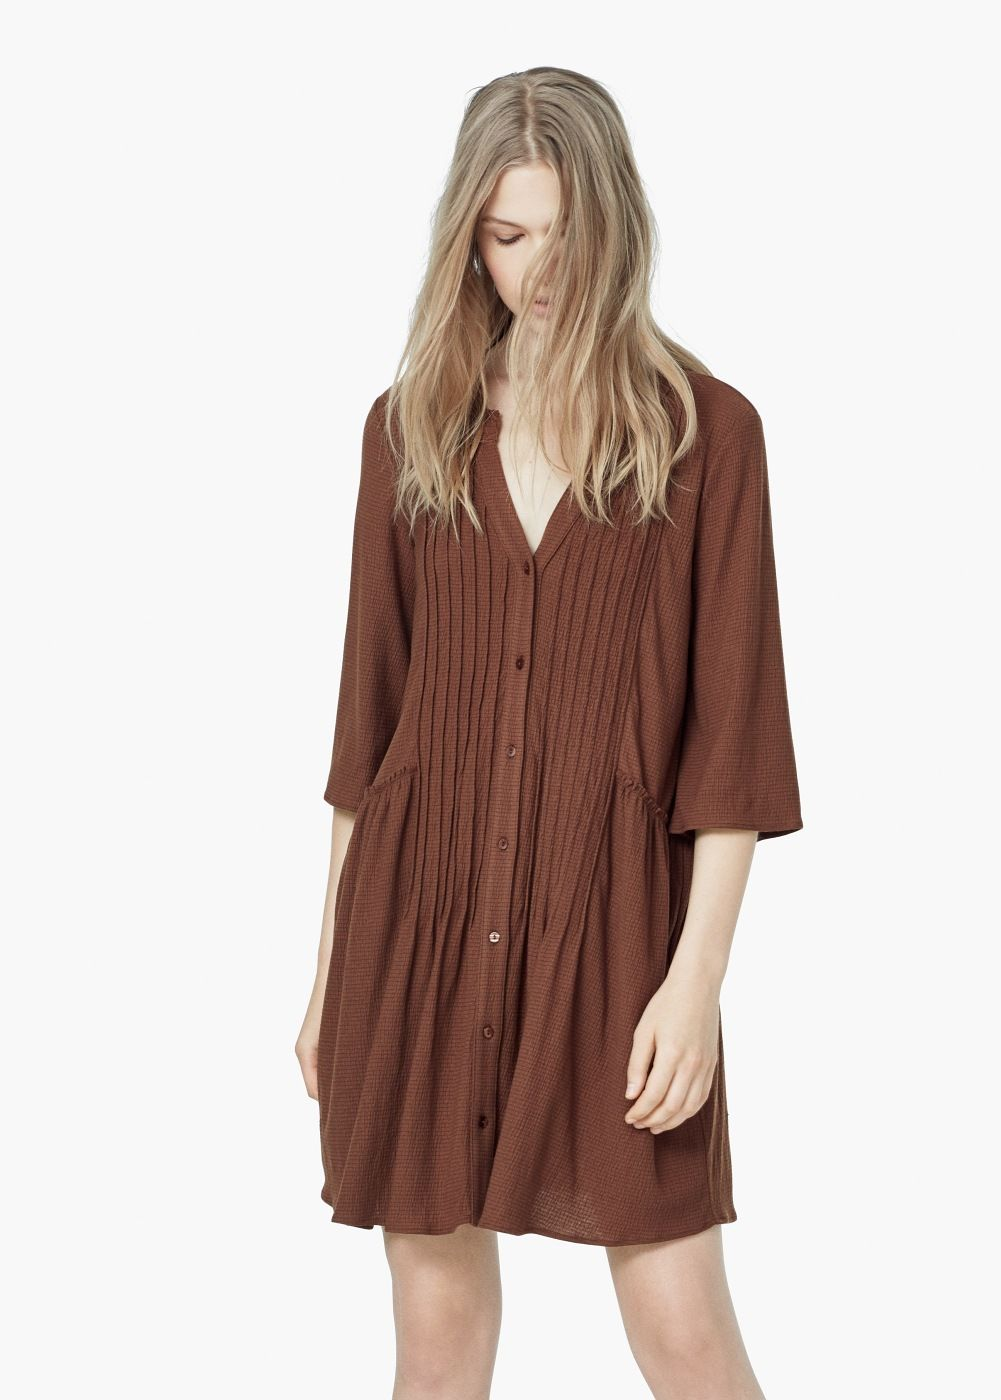 Textured pleats dress - Women   Wishlist   Pinterest   Robe ... e55558b7bdf9